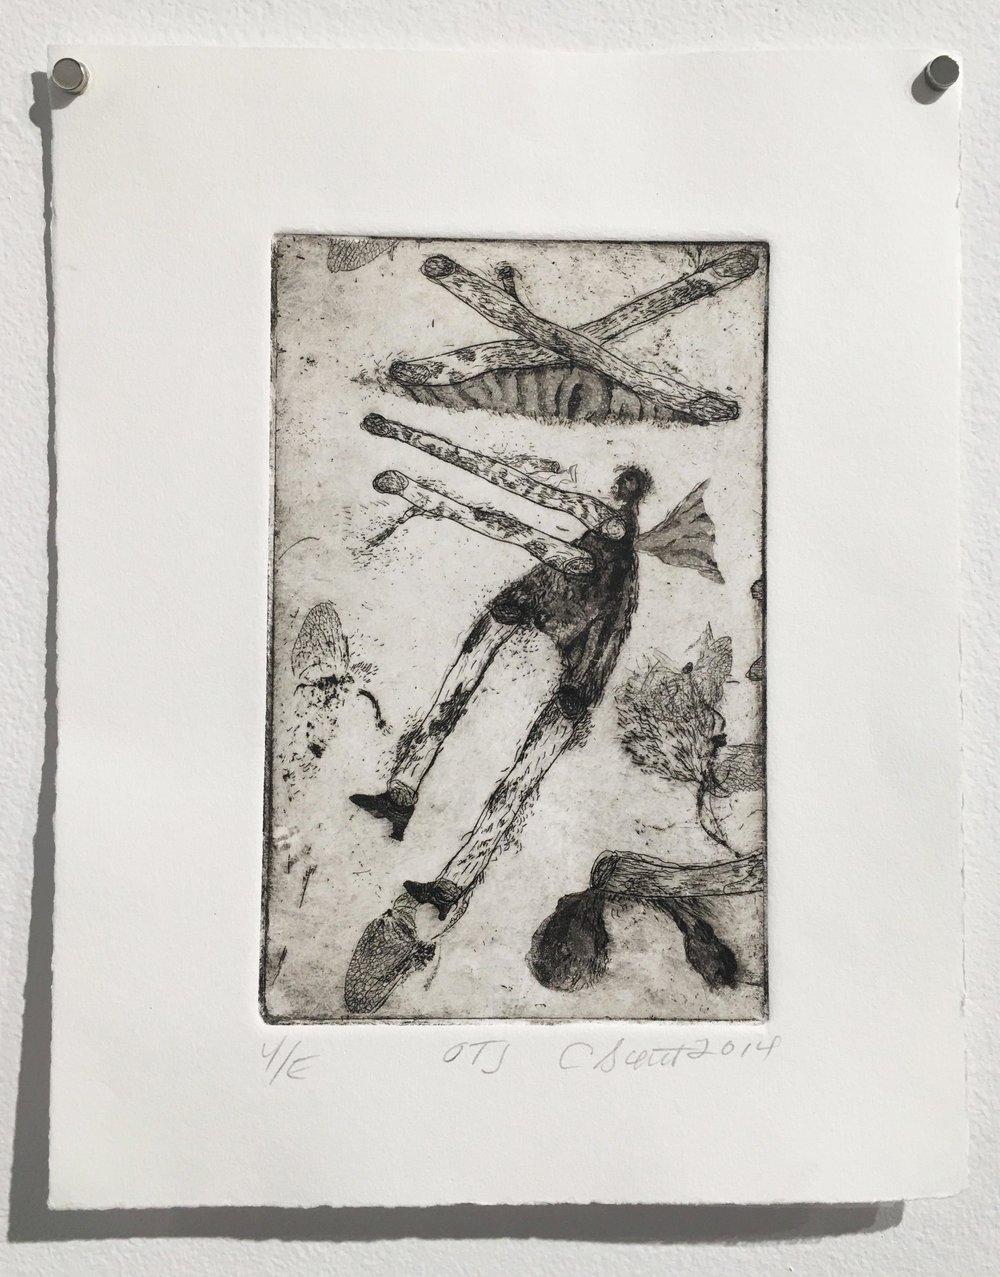 Second Prize – Cathy Senitt, OTJ (2014), intaglio